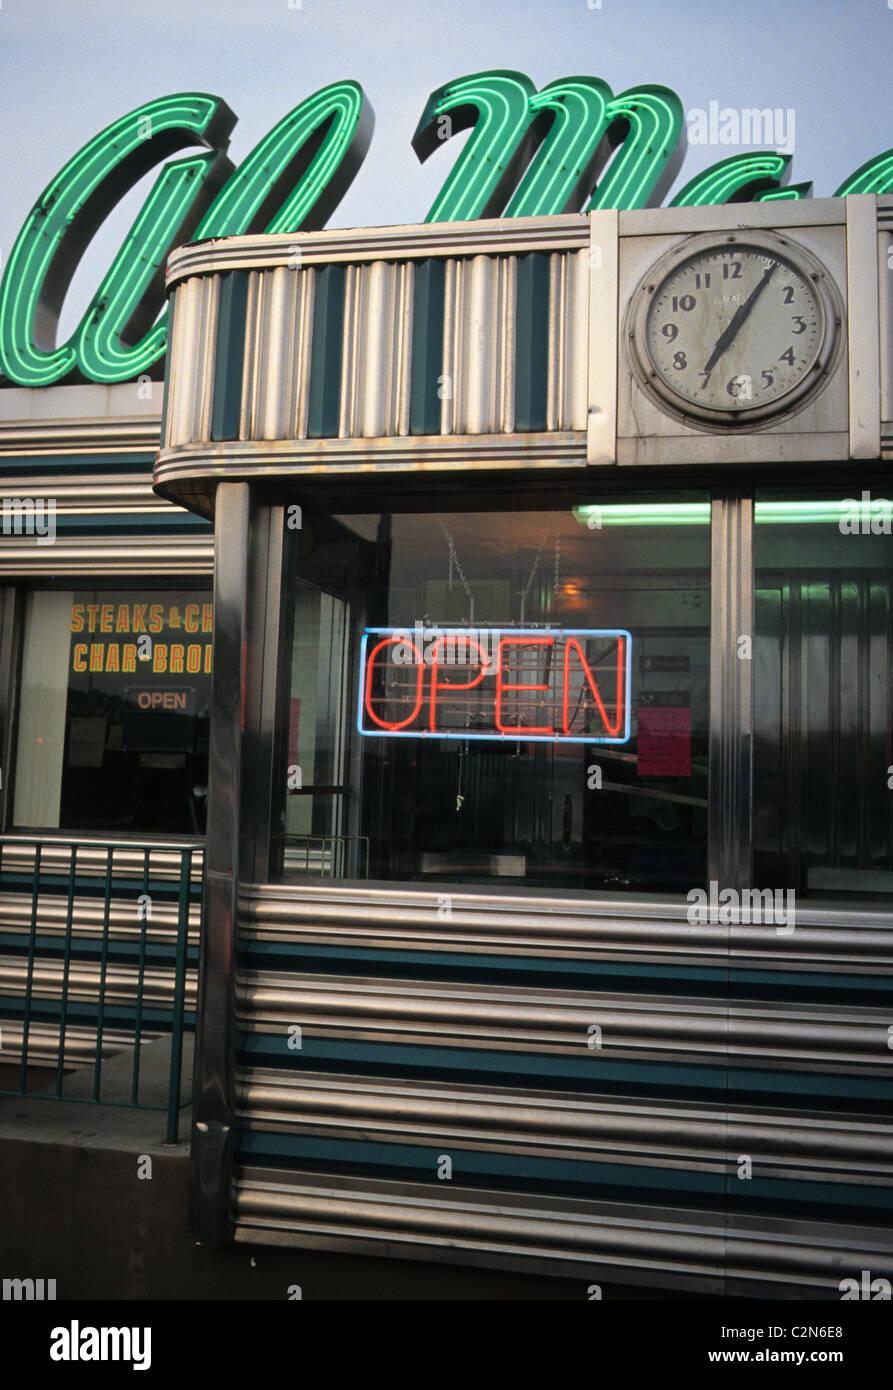 Al Macs Diner located in Fall River, Massachusetts  Clock